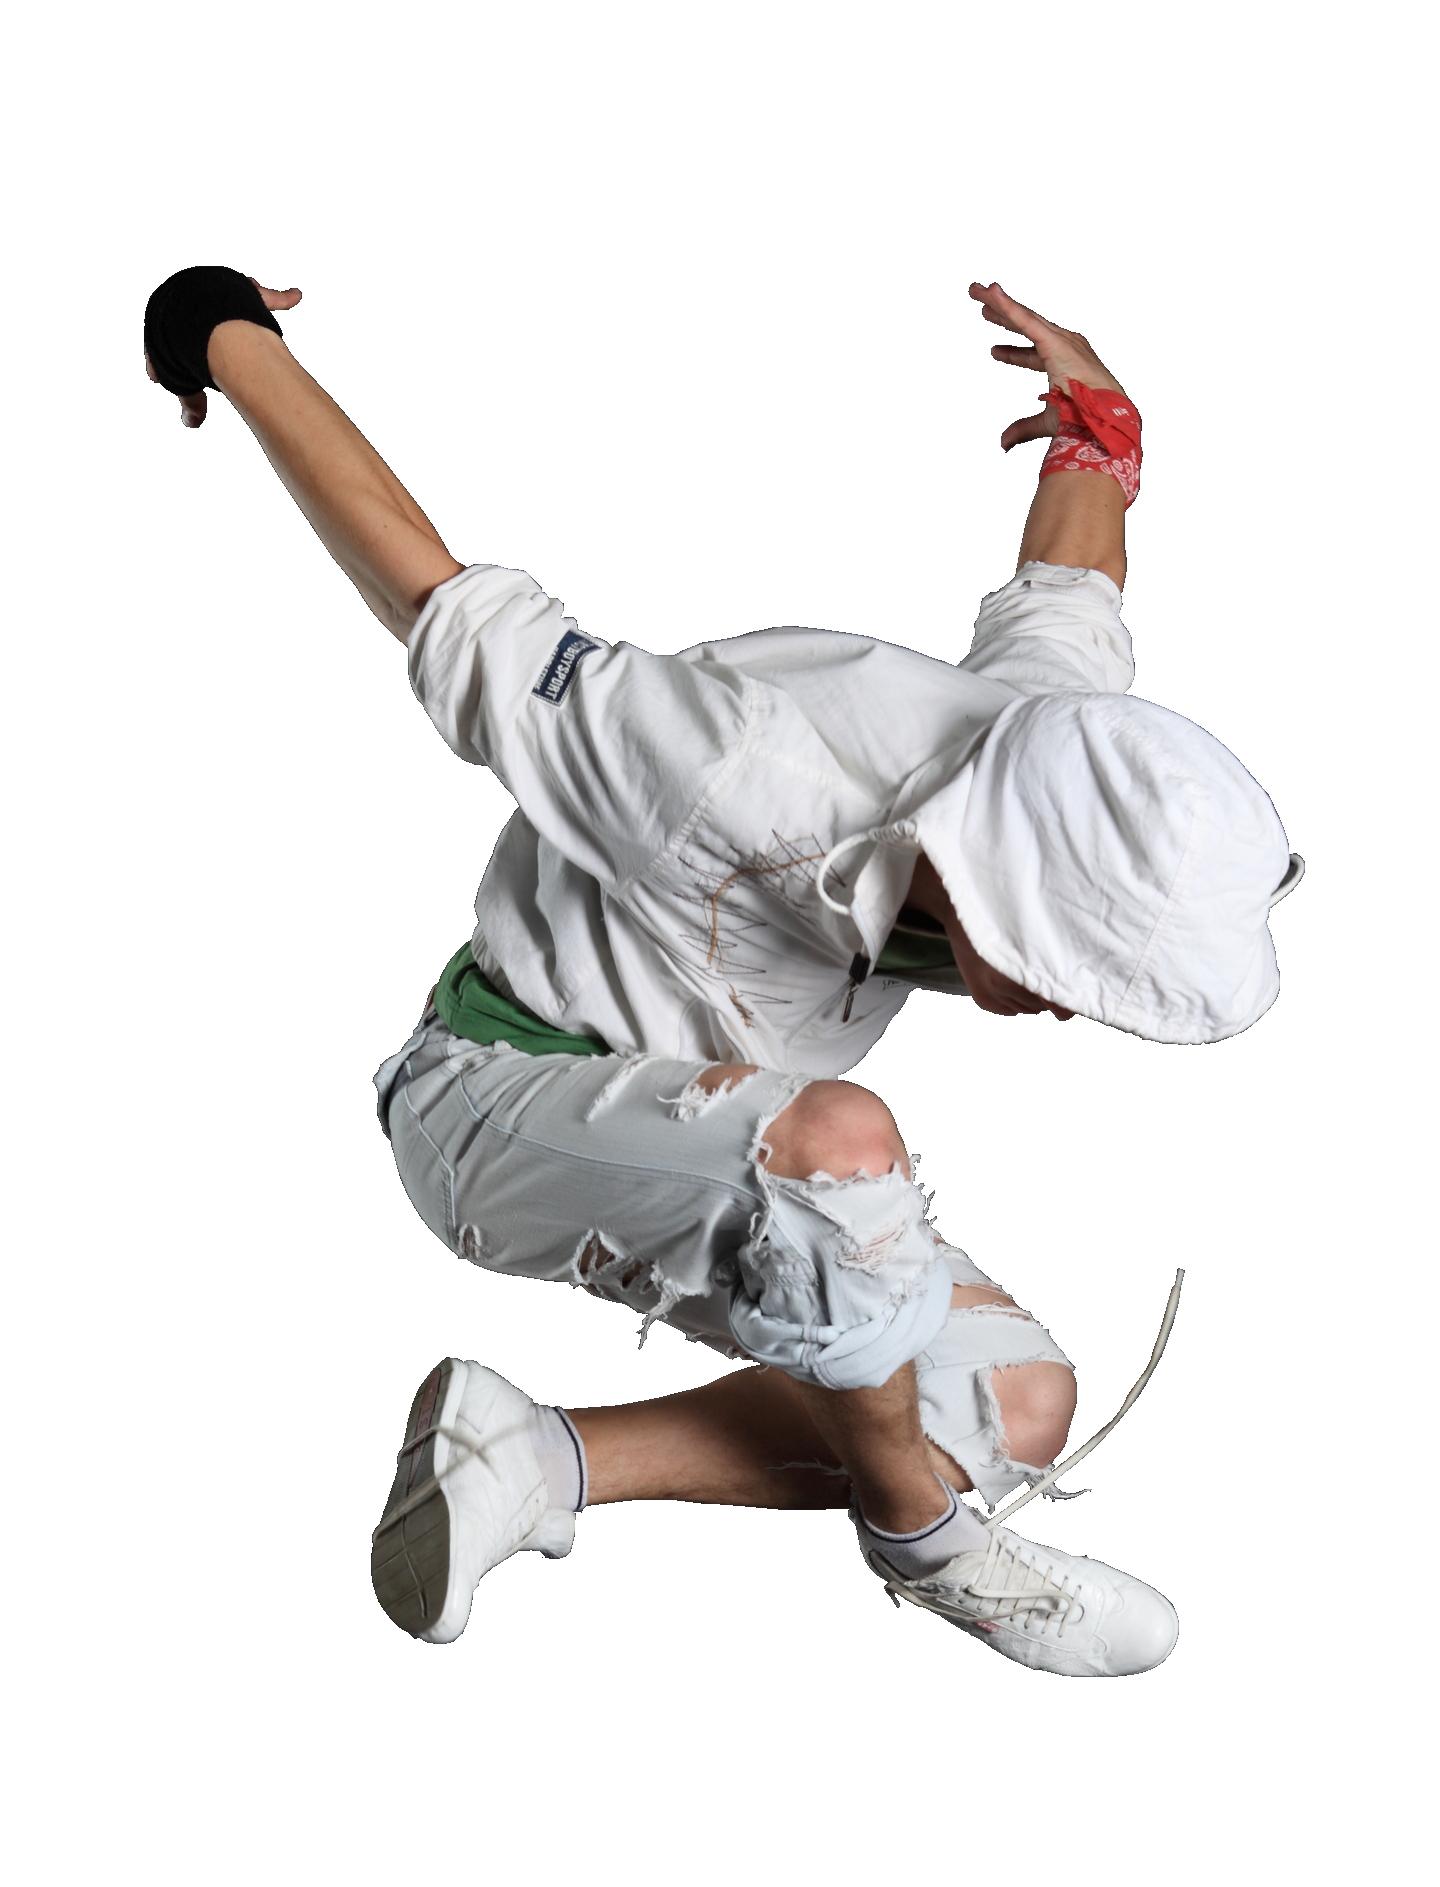 Pin by Kosina Zoltán on Dance | Dance, Dance images, Dancer